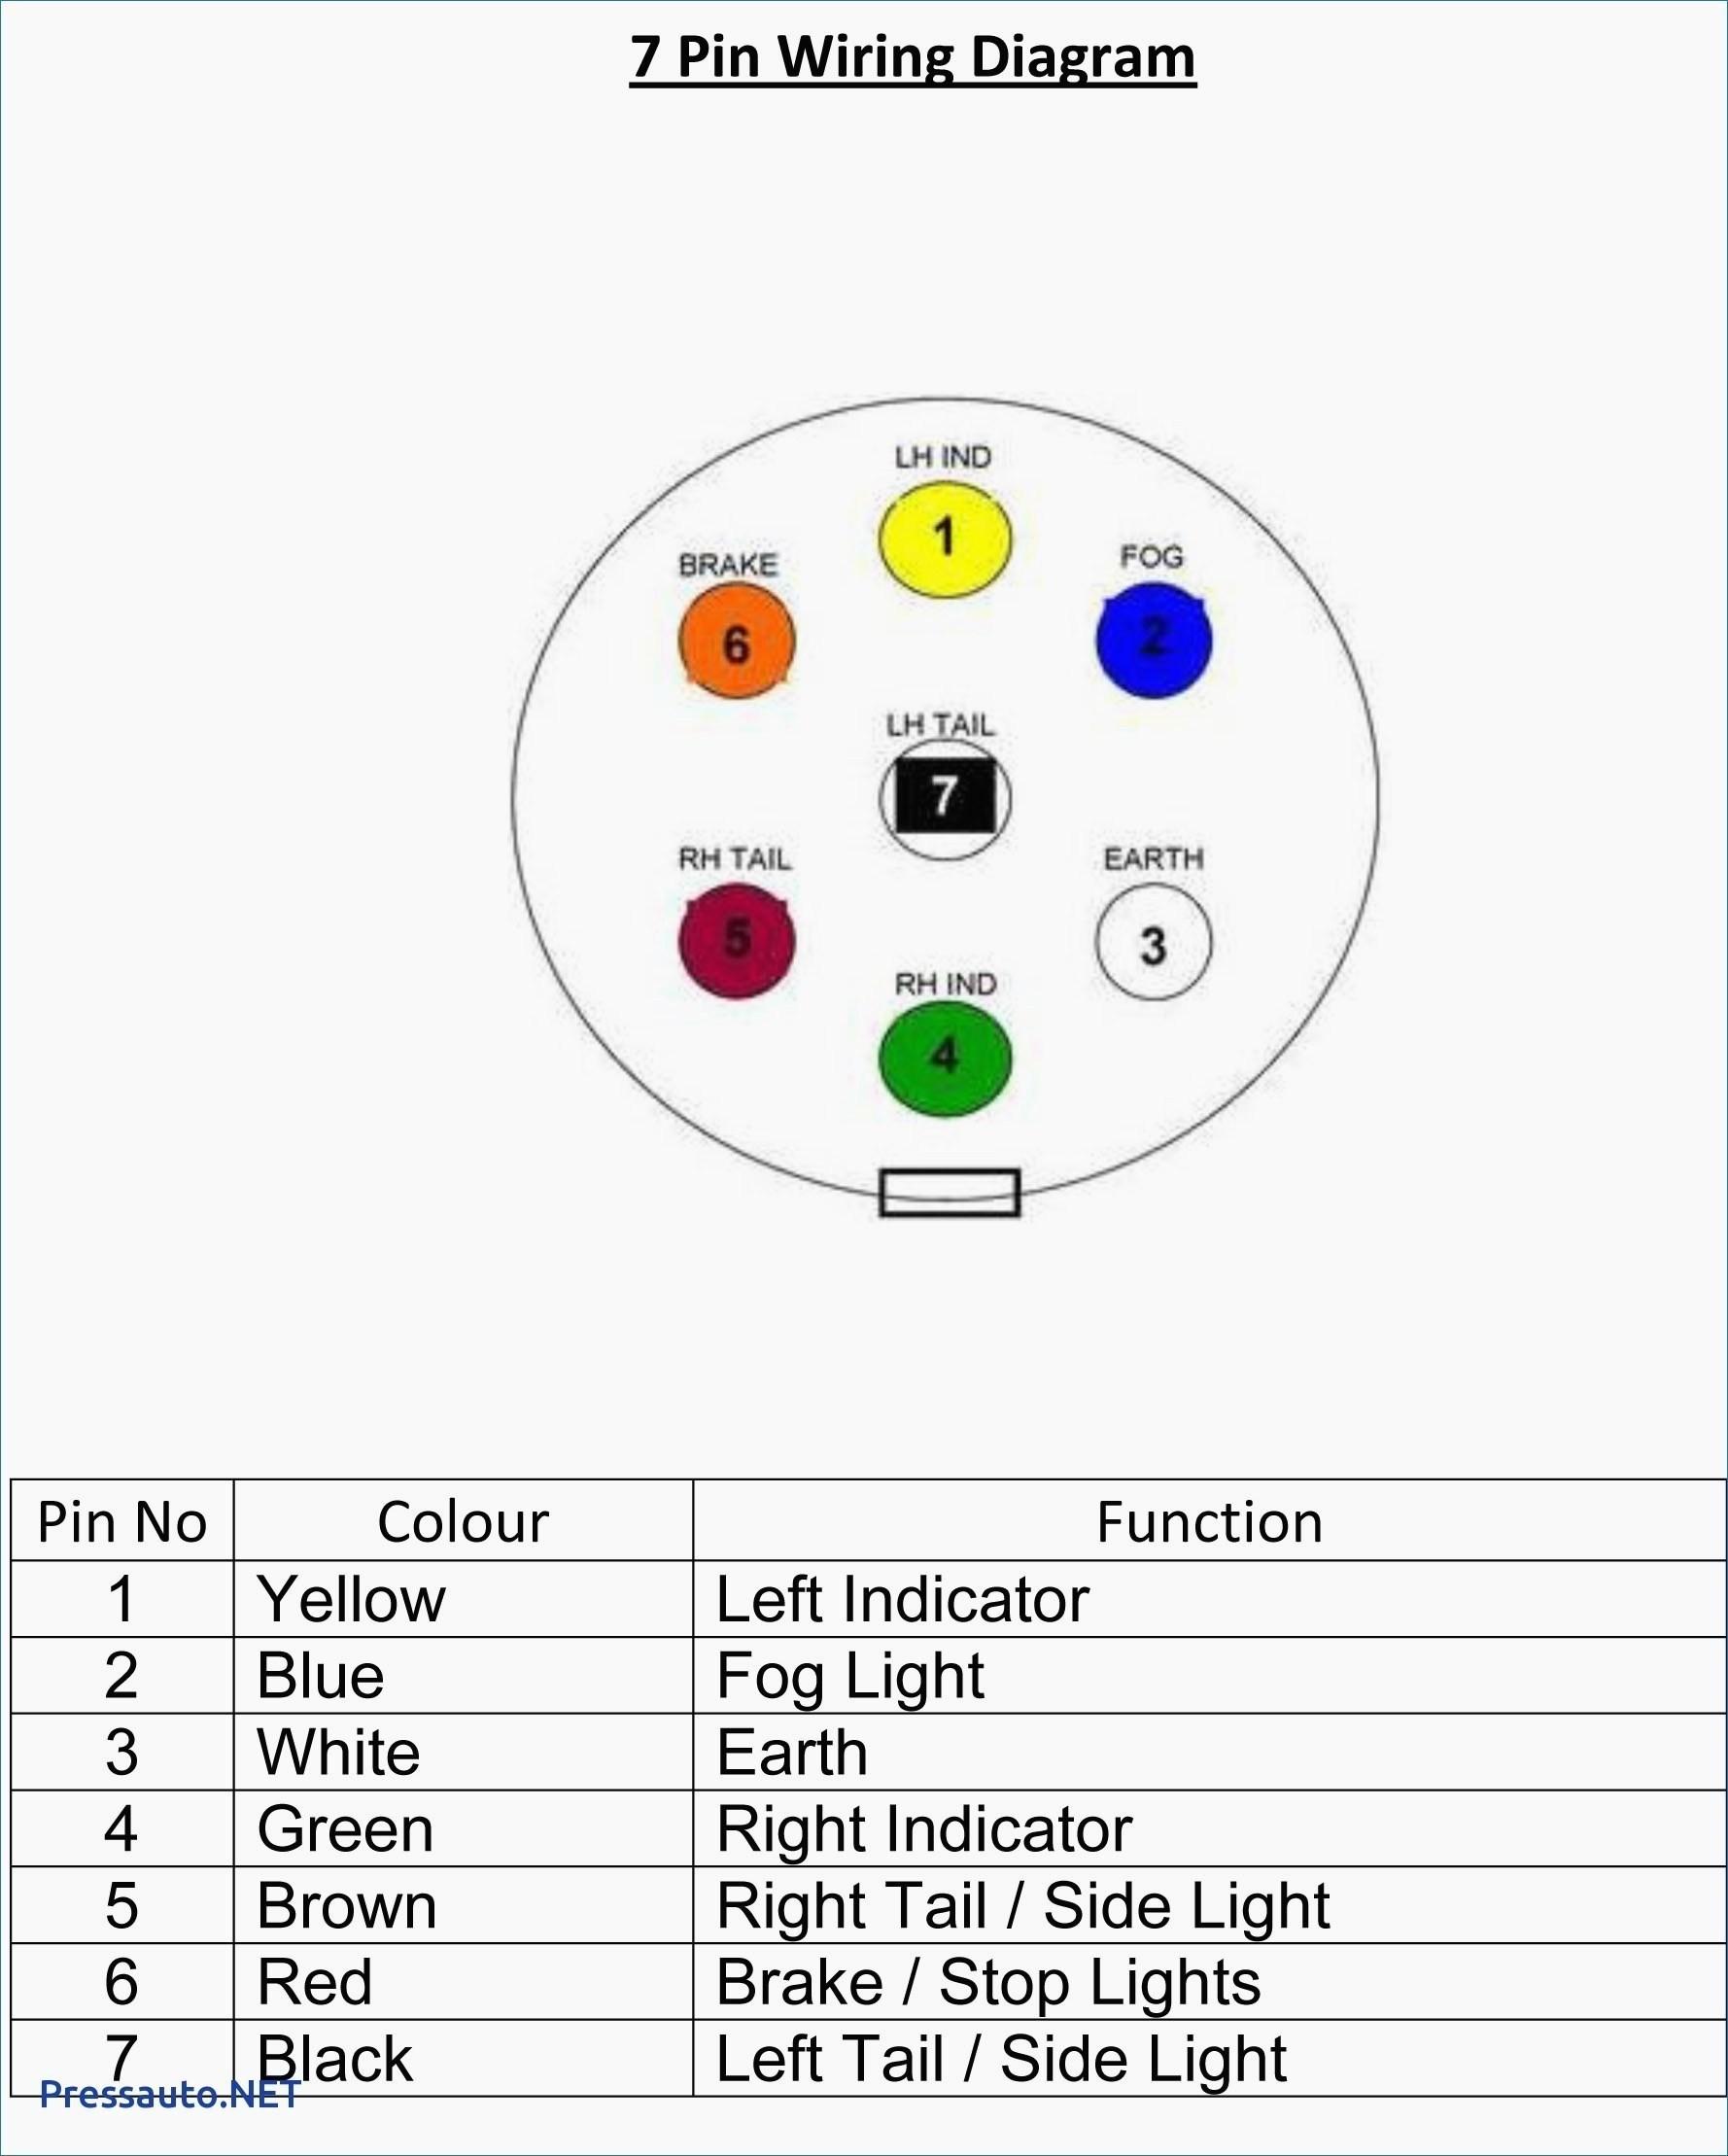 Ford 7 Way Plug Wiring Diagram - Wiring Diagram Server school-answer -  school-answer.ristoranteitredenari.itRistorante I Tre Denari Manerbio